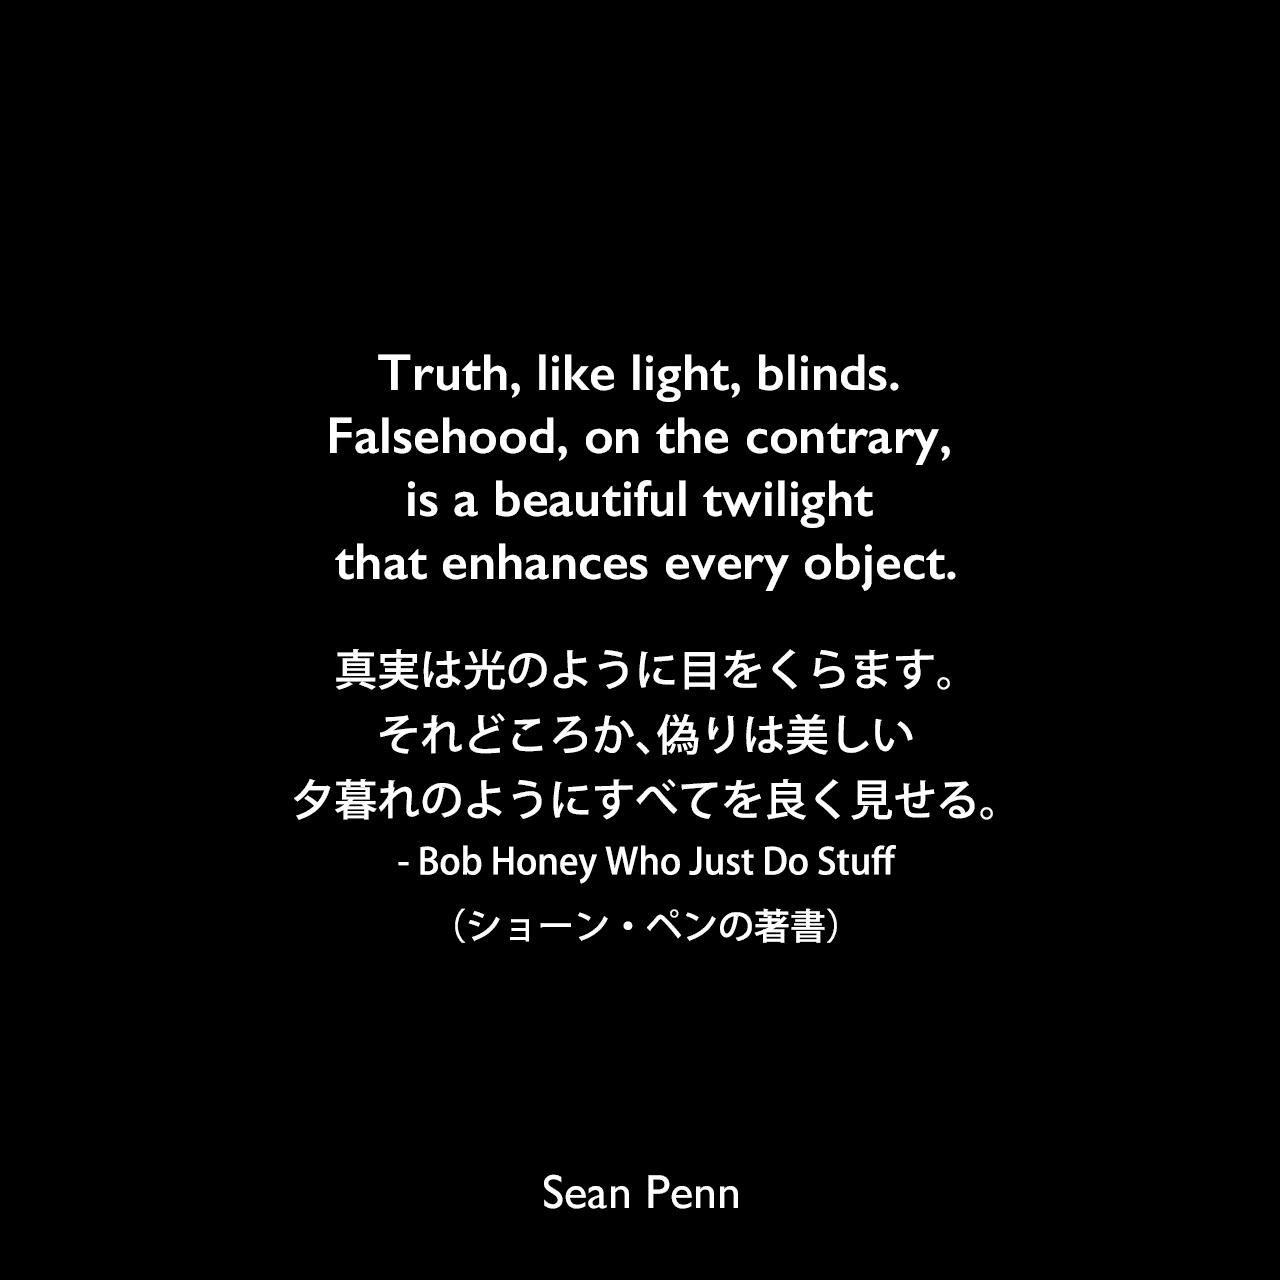 Truth, like light, blinds. Falsehood, on the contrary, is a beautiful twilight that enhances every object.真実は光のように目をくらます。それどころか、偽りは美しい夕暮れのようにすべてを良く見せる。 - Bob Honey Who Just Do Stuff(ショーン・ペンの著書)Sean Penn